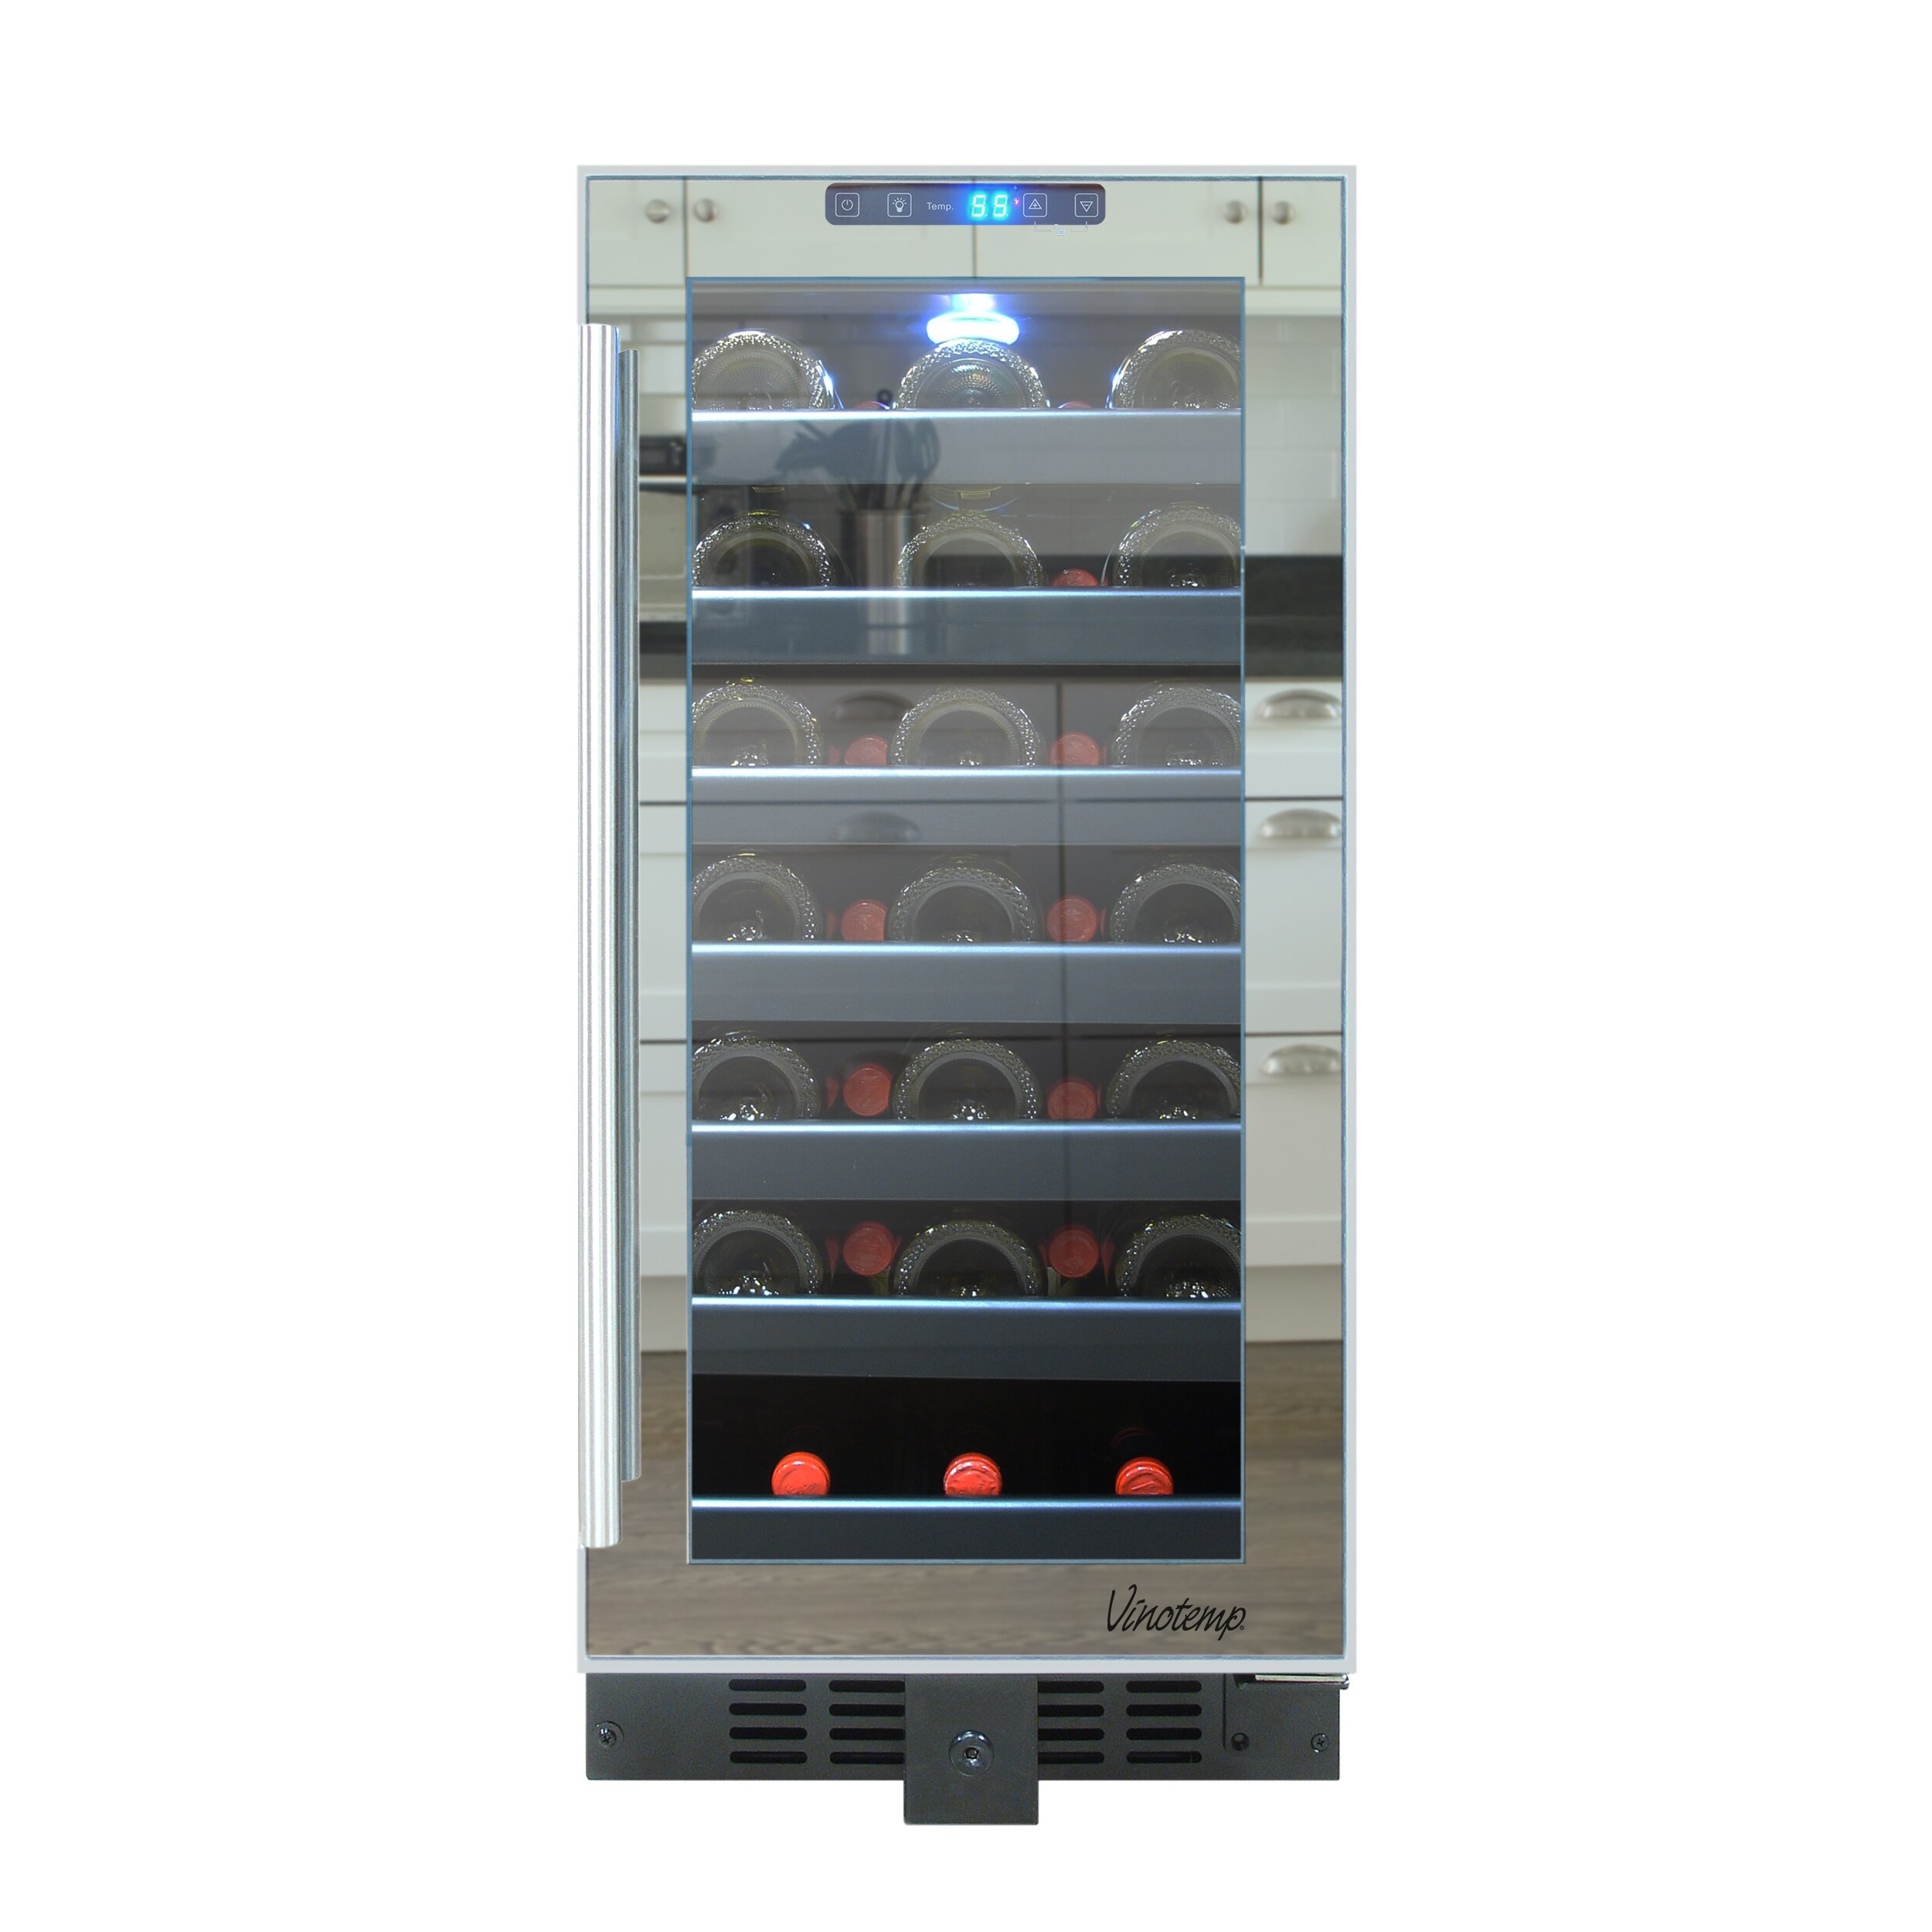 vinotemp 33 bottle single zone built in wine refrigerator reviews wayfair. Black Bedroom Furniture Sets. Home Design Ideas